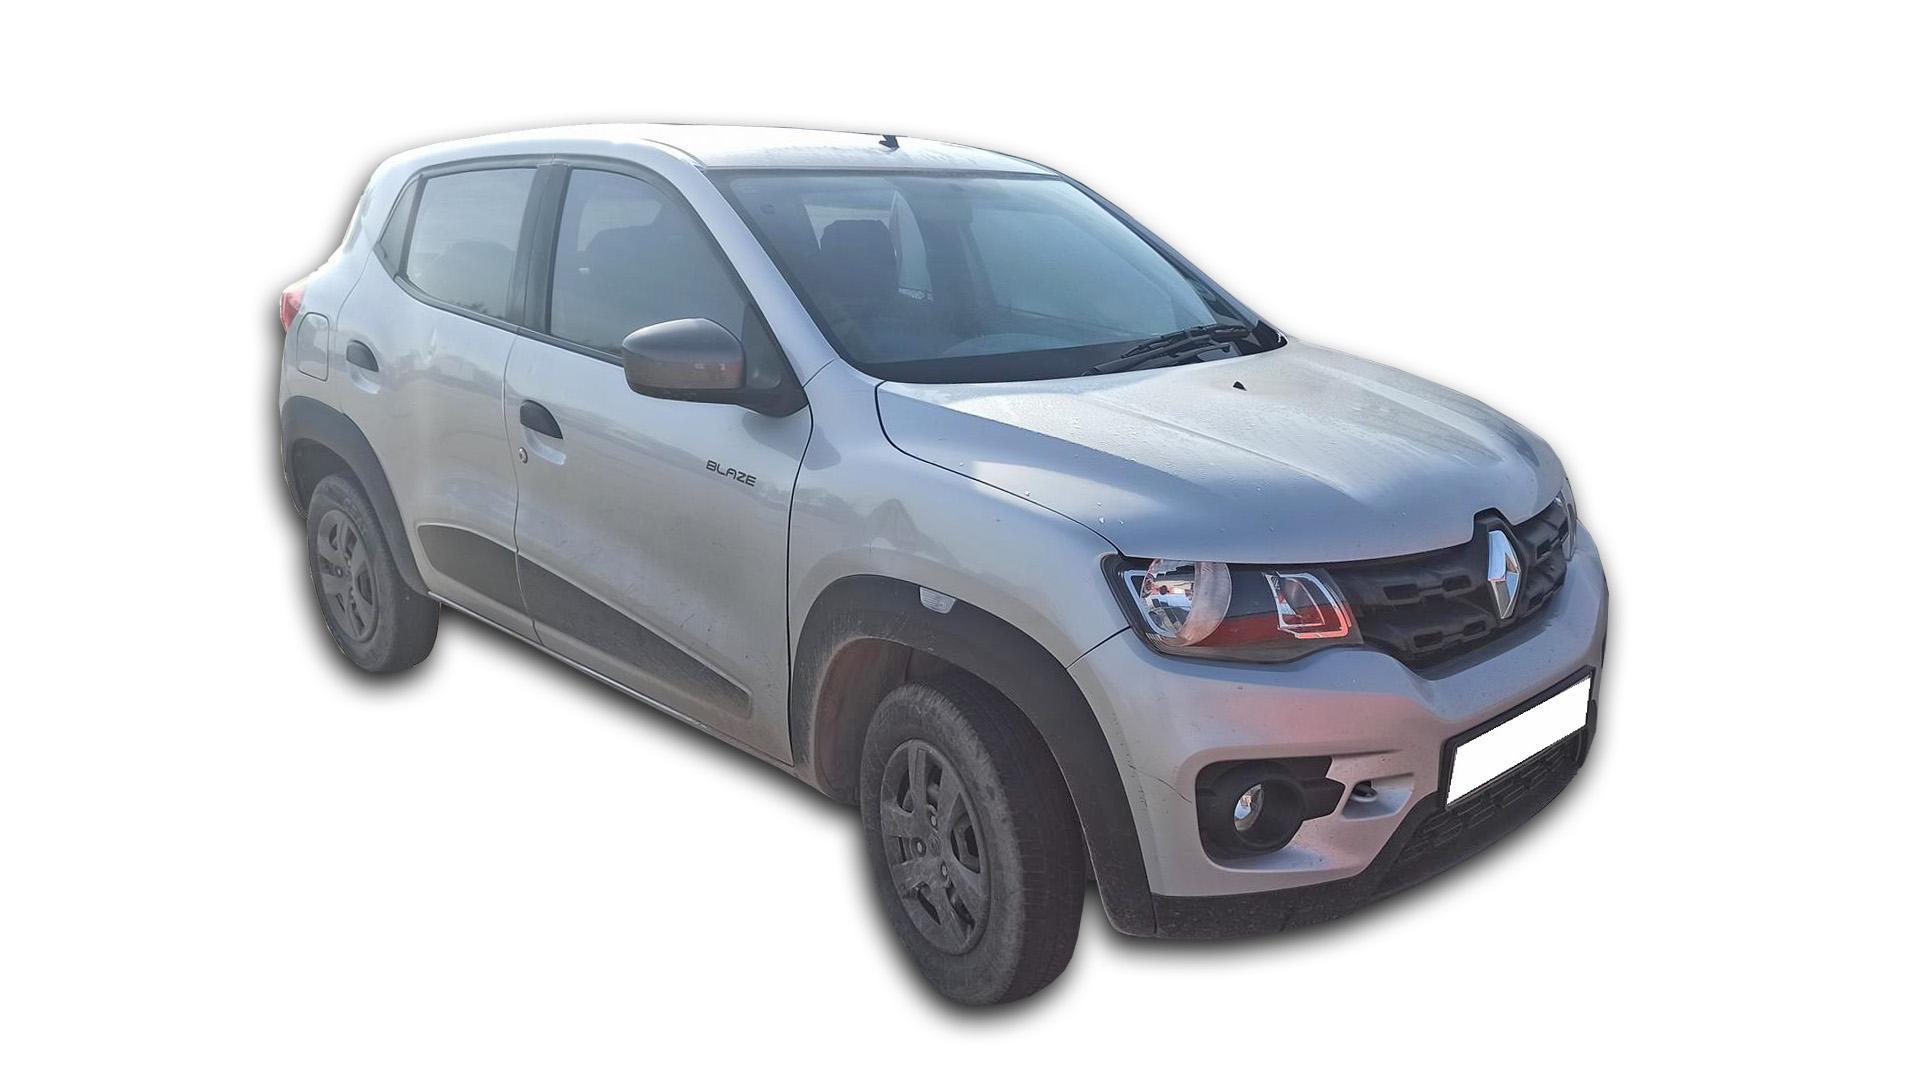 Renault Kwid 1.0 Dynamique 5DR